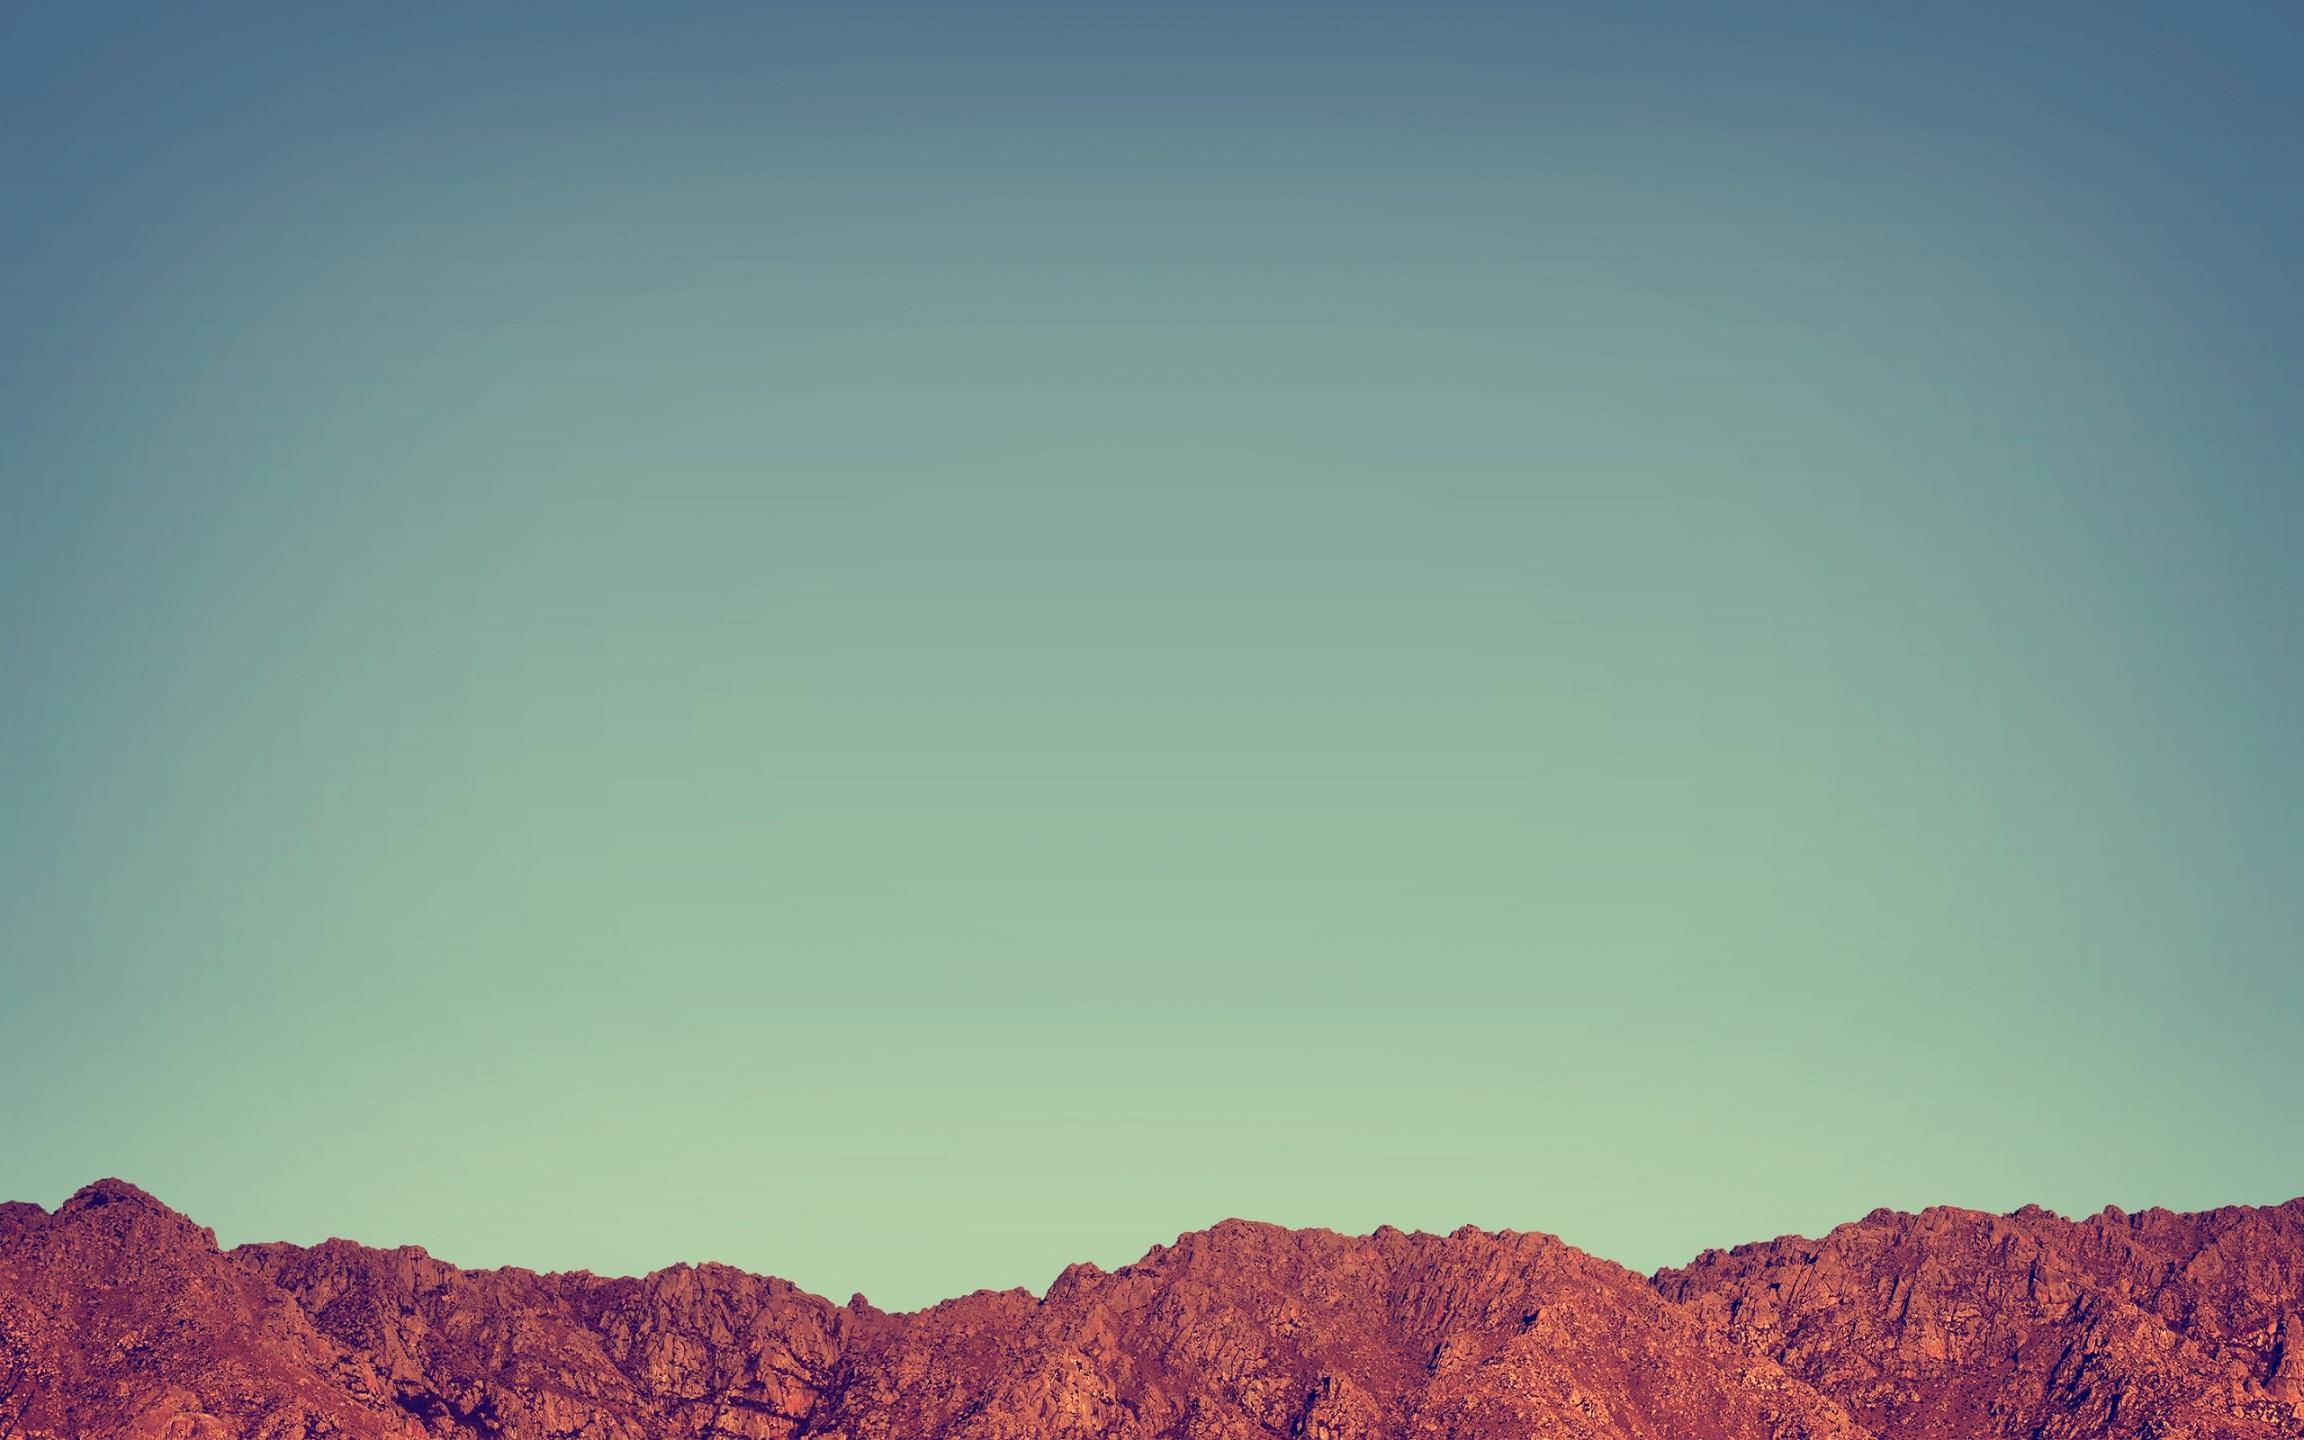 Iphone wallpaper tumblr retina - Macbook Pro Retina Wallpaper Tumblr Wallpaper Details